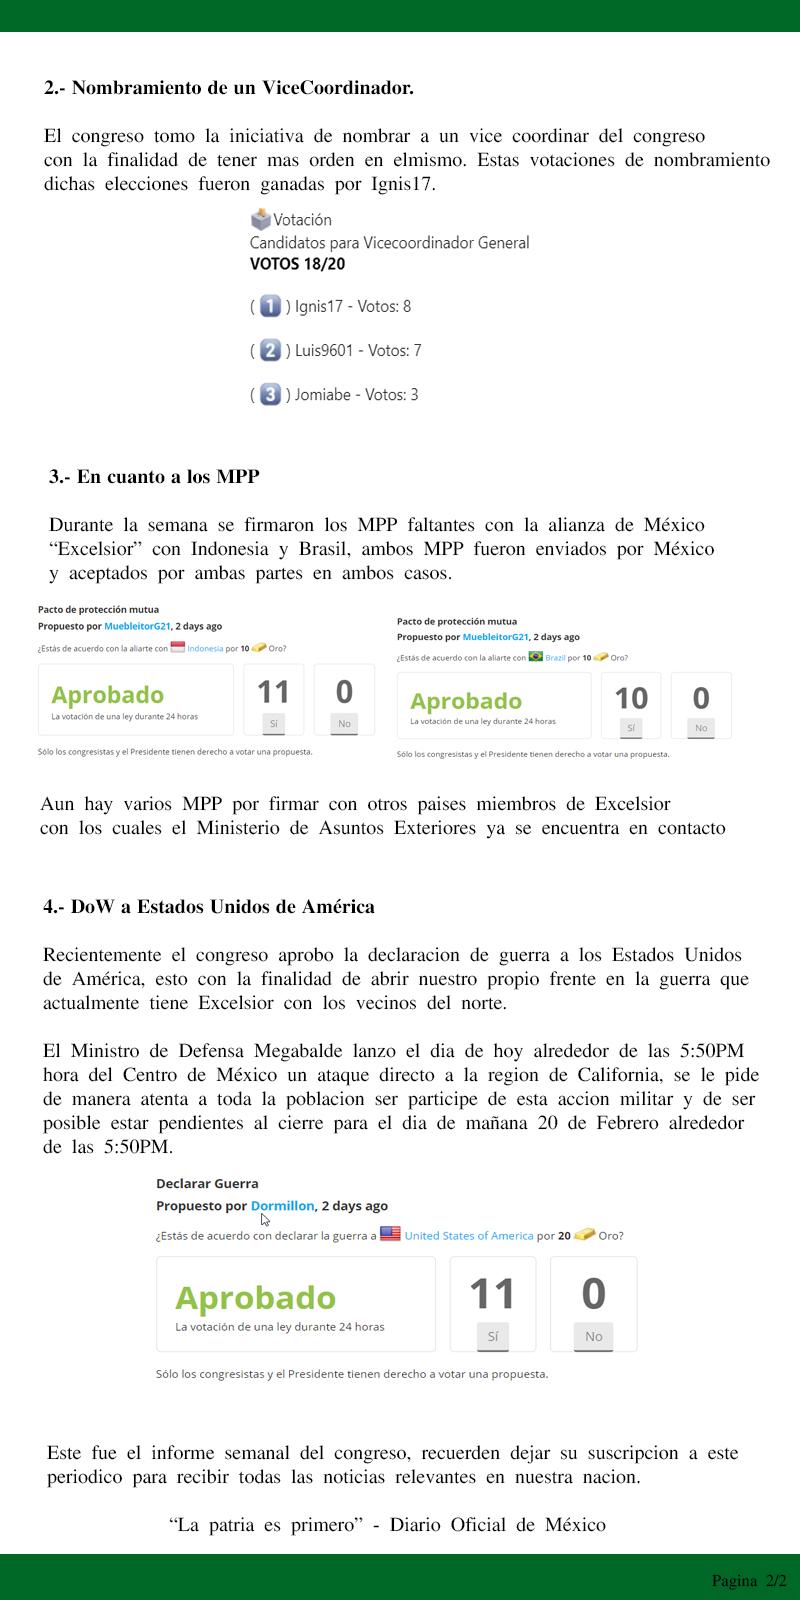 https://i.ibb.co/qrNJvn7/1er-Informe-del-5to-Congreso-2.jpg